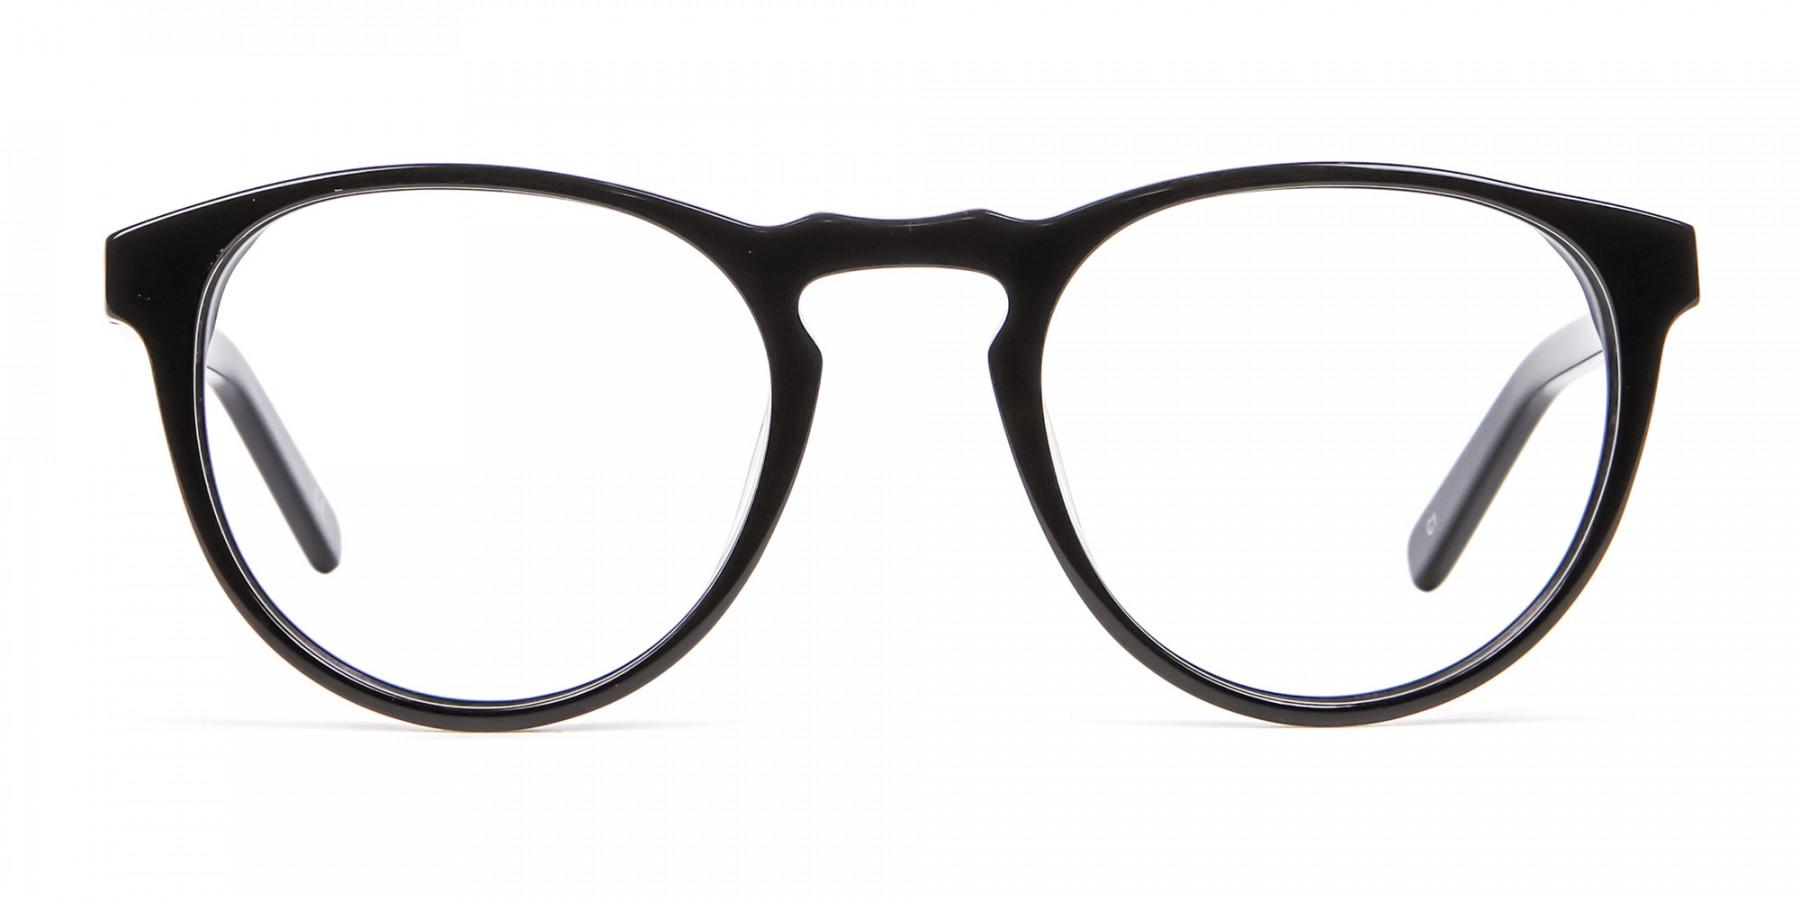 Round Black Glasses Online